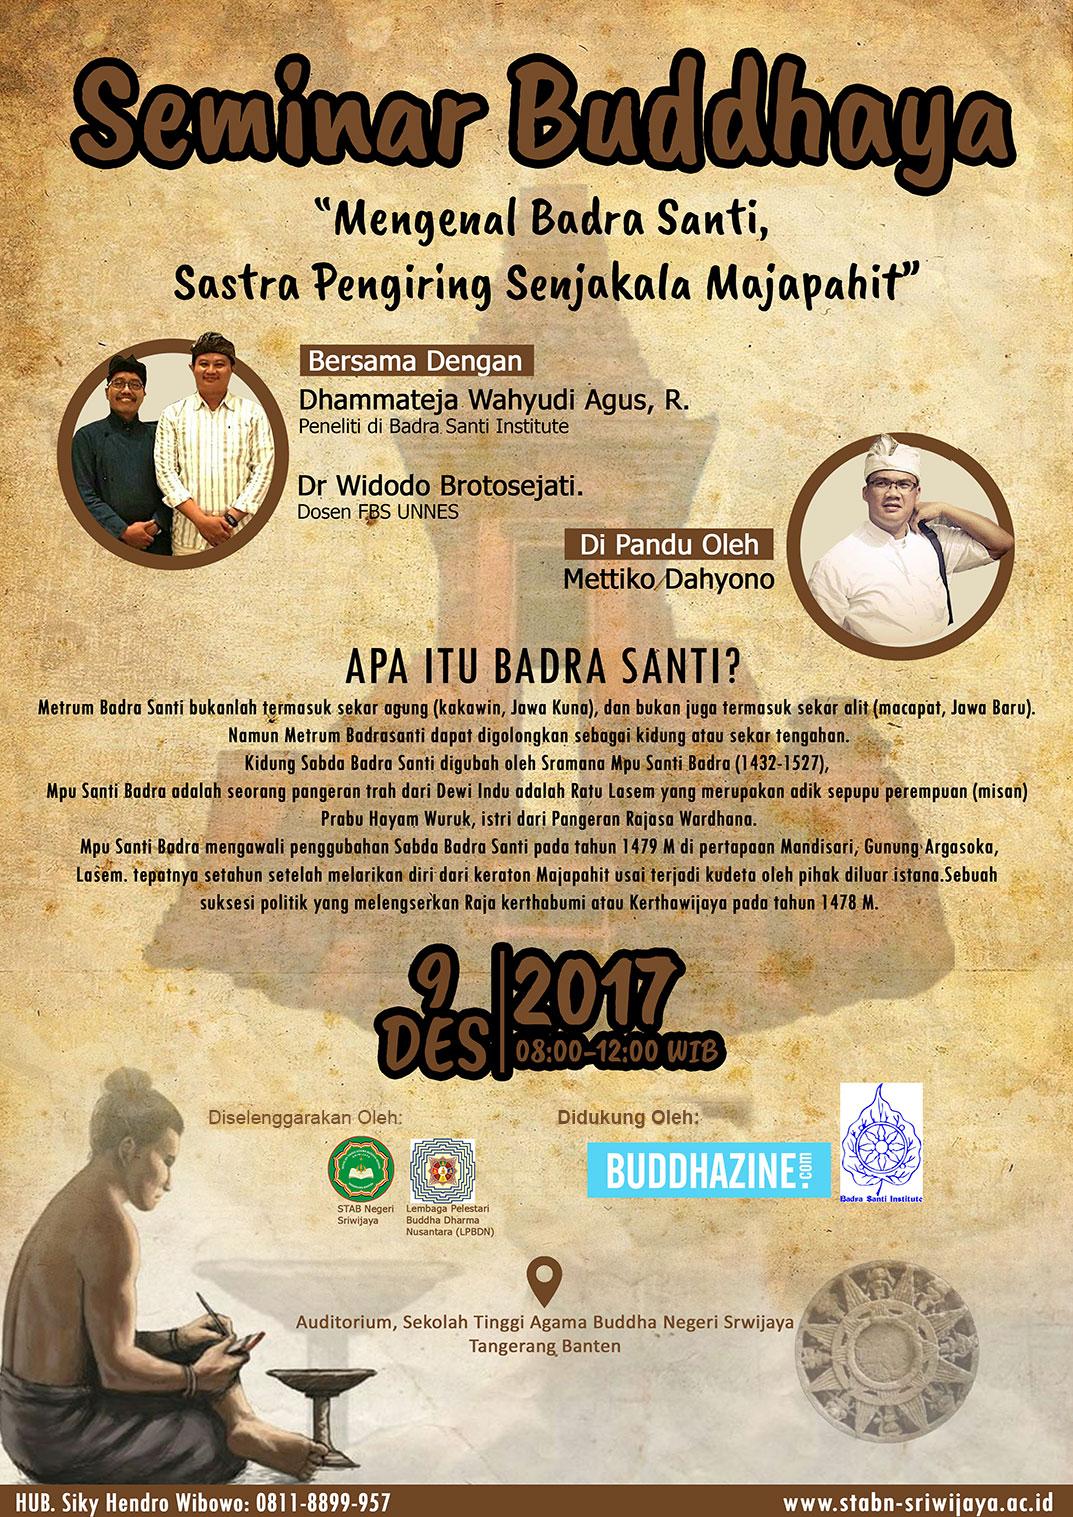 Mengenal Badra Santi, Sastra Pengiring Senjakala Majapahit